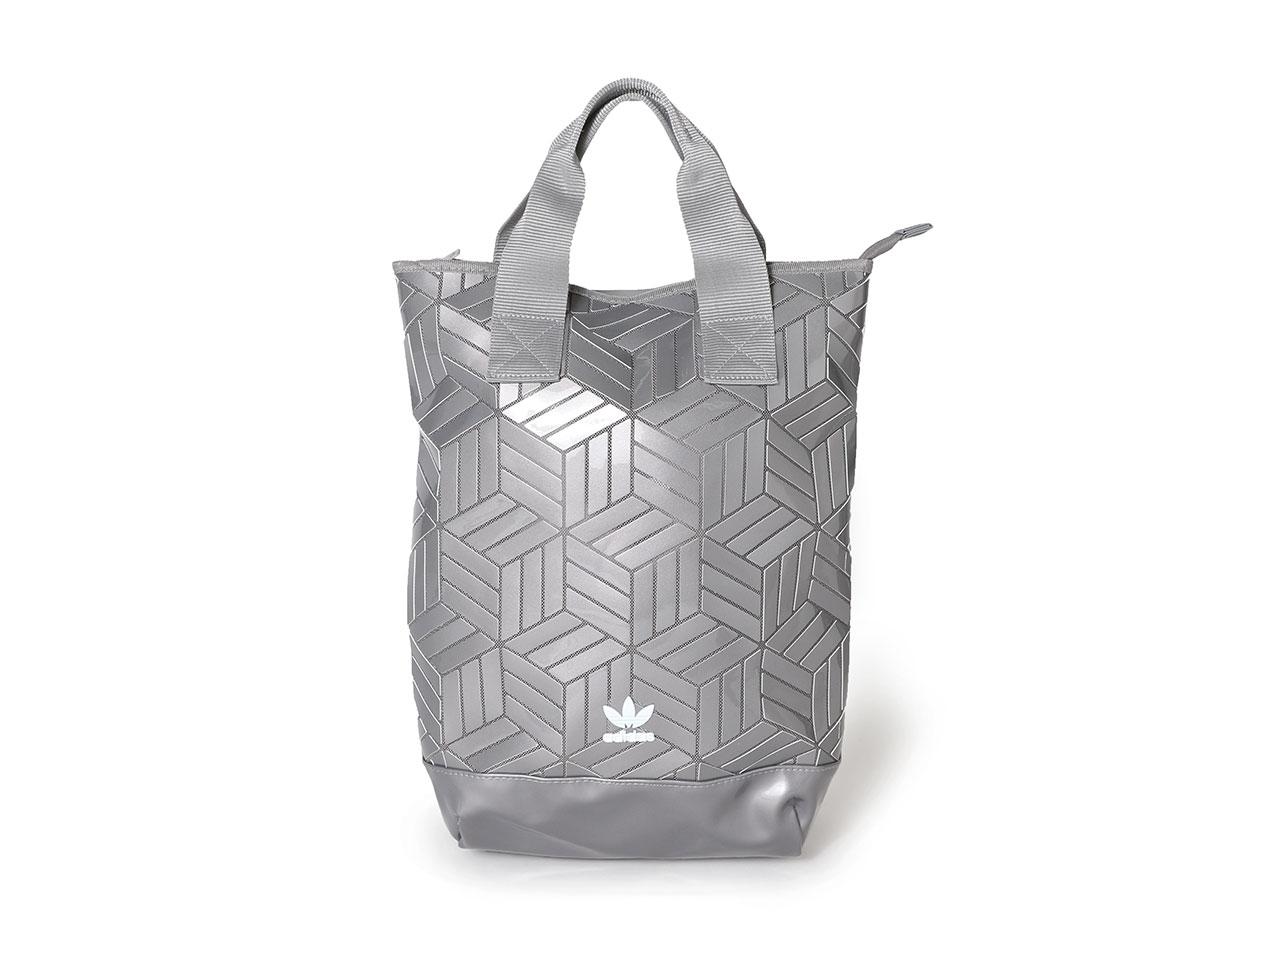 adidas Originals ROLL TOP BACKPACK 3D(FM6310)【アディダス オリジナルス】【バックパック】【バッグ】【カバン】【ストリート】【スポーツ】